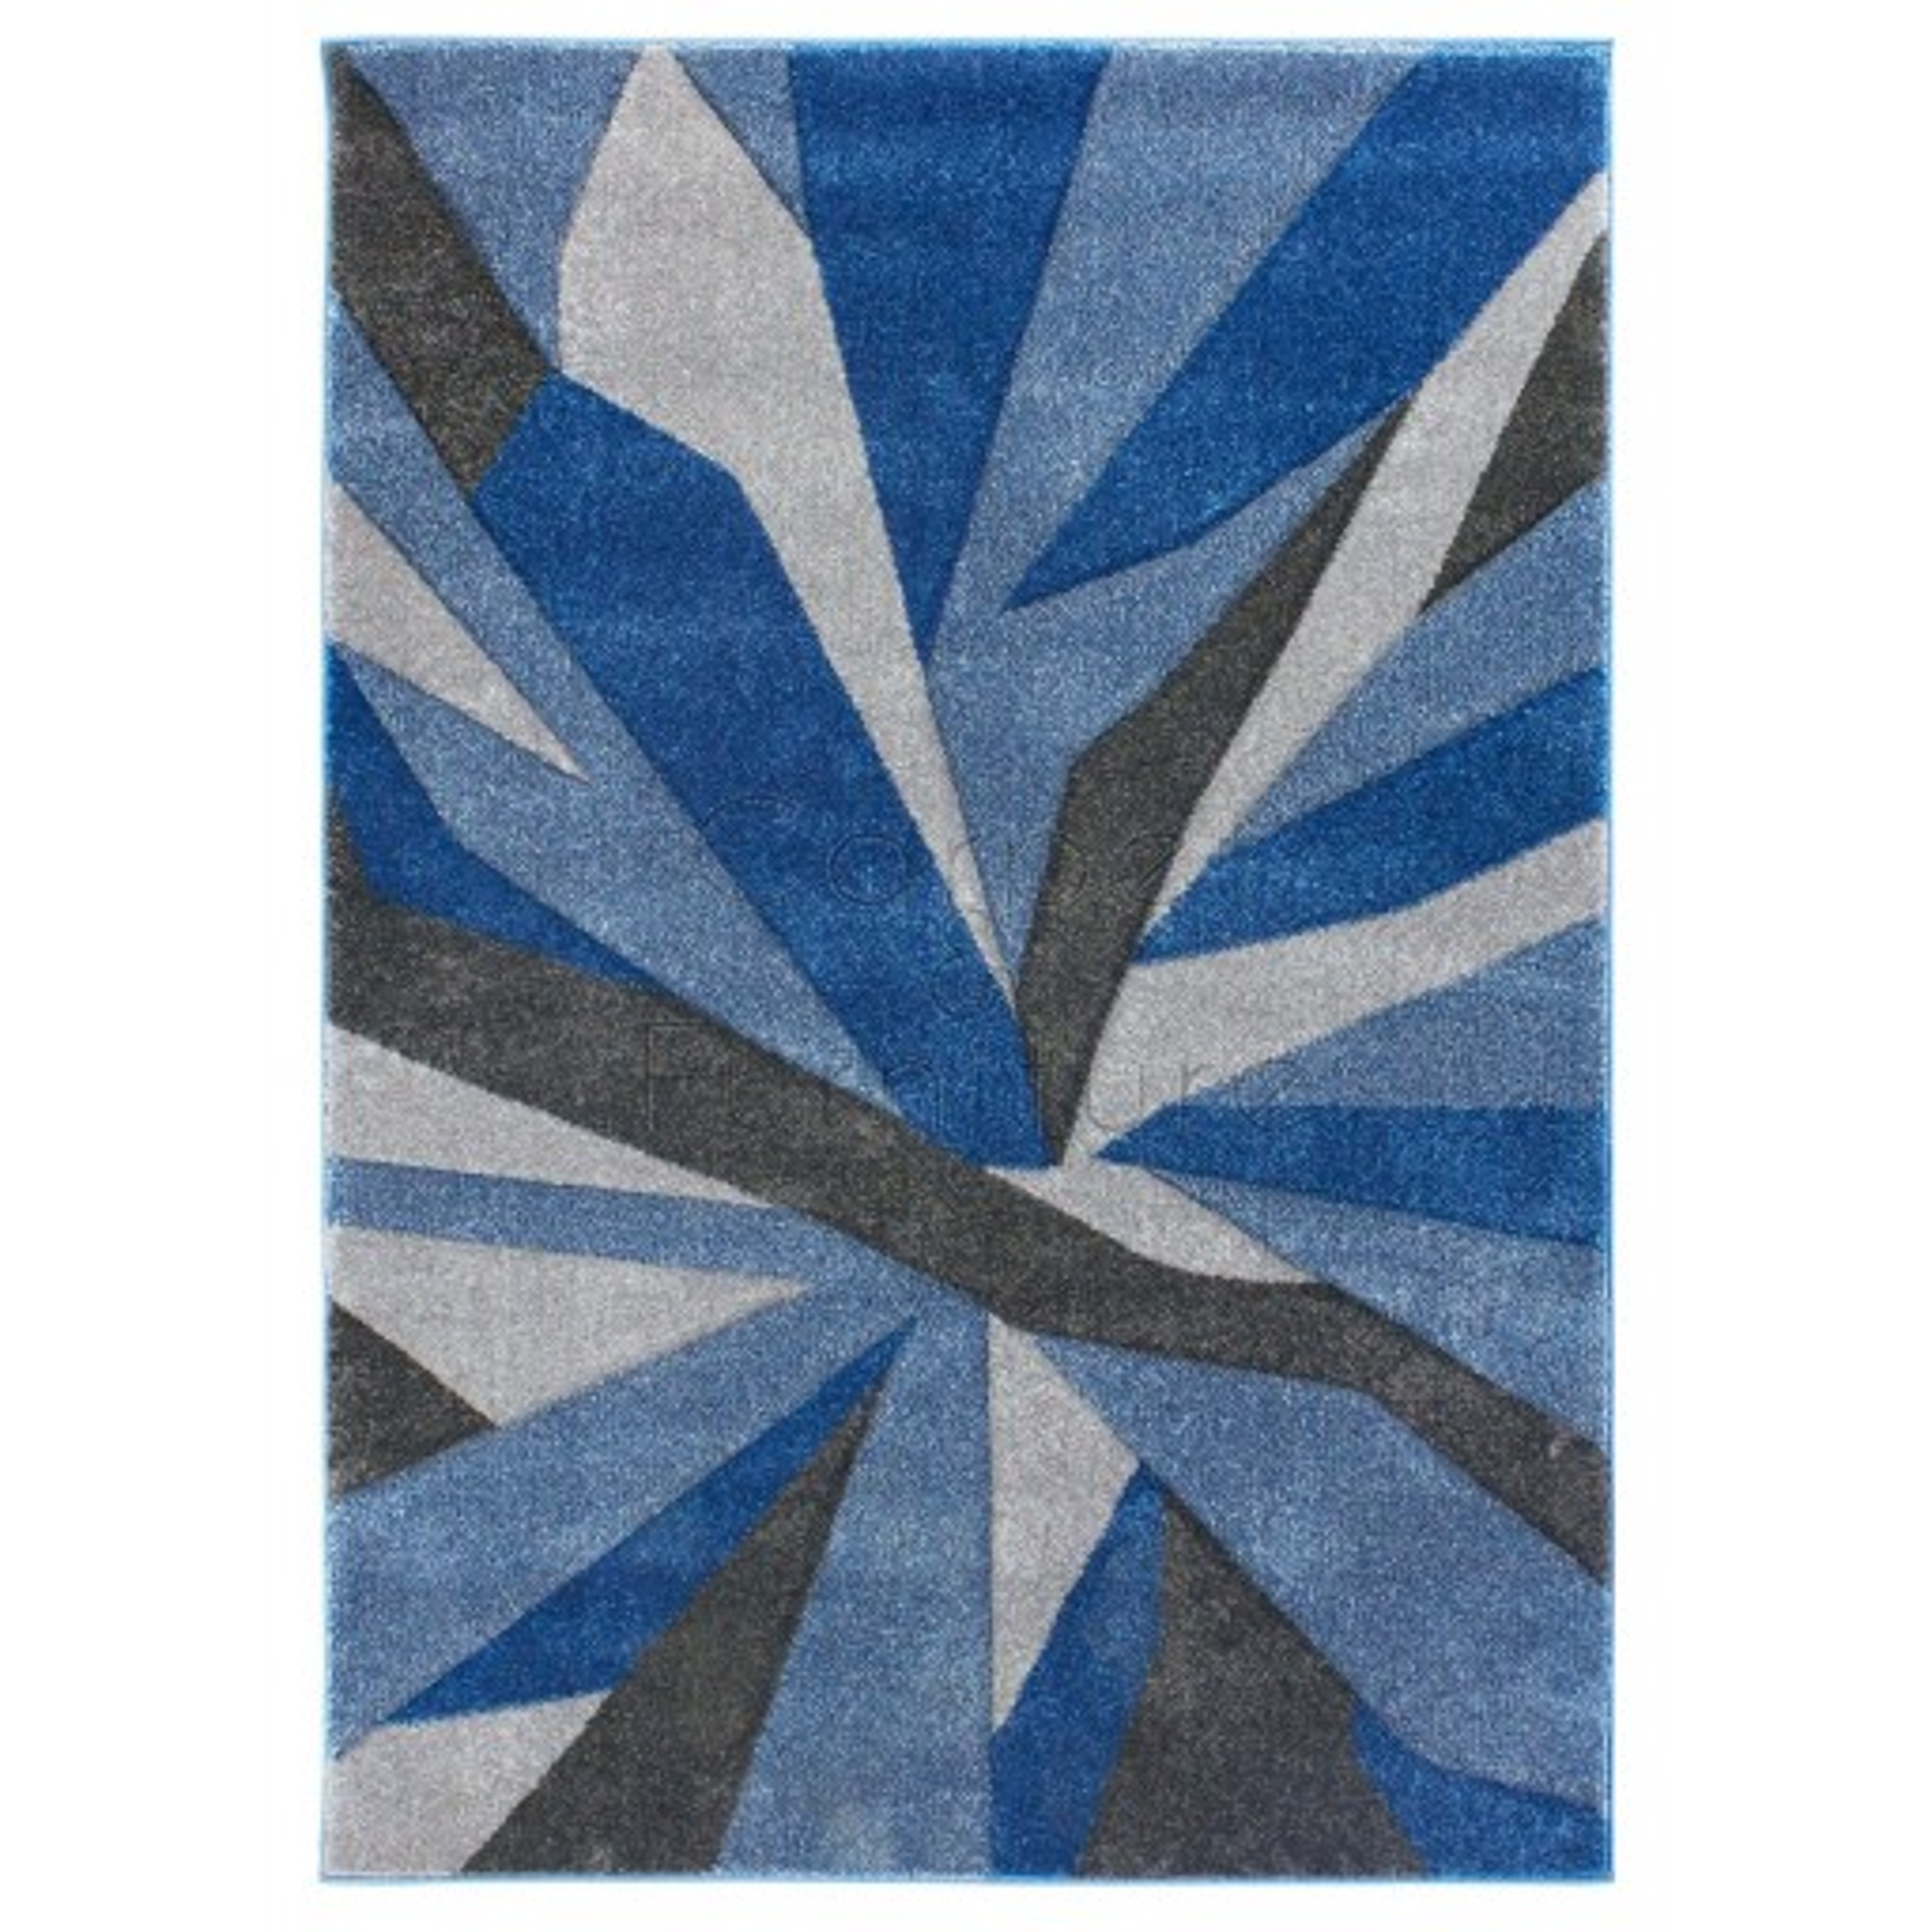 "Shatter Rug - Blue Grey - Size 120 x 170 cm (4' x 5'7"")"